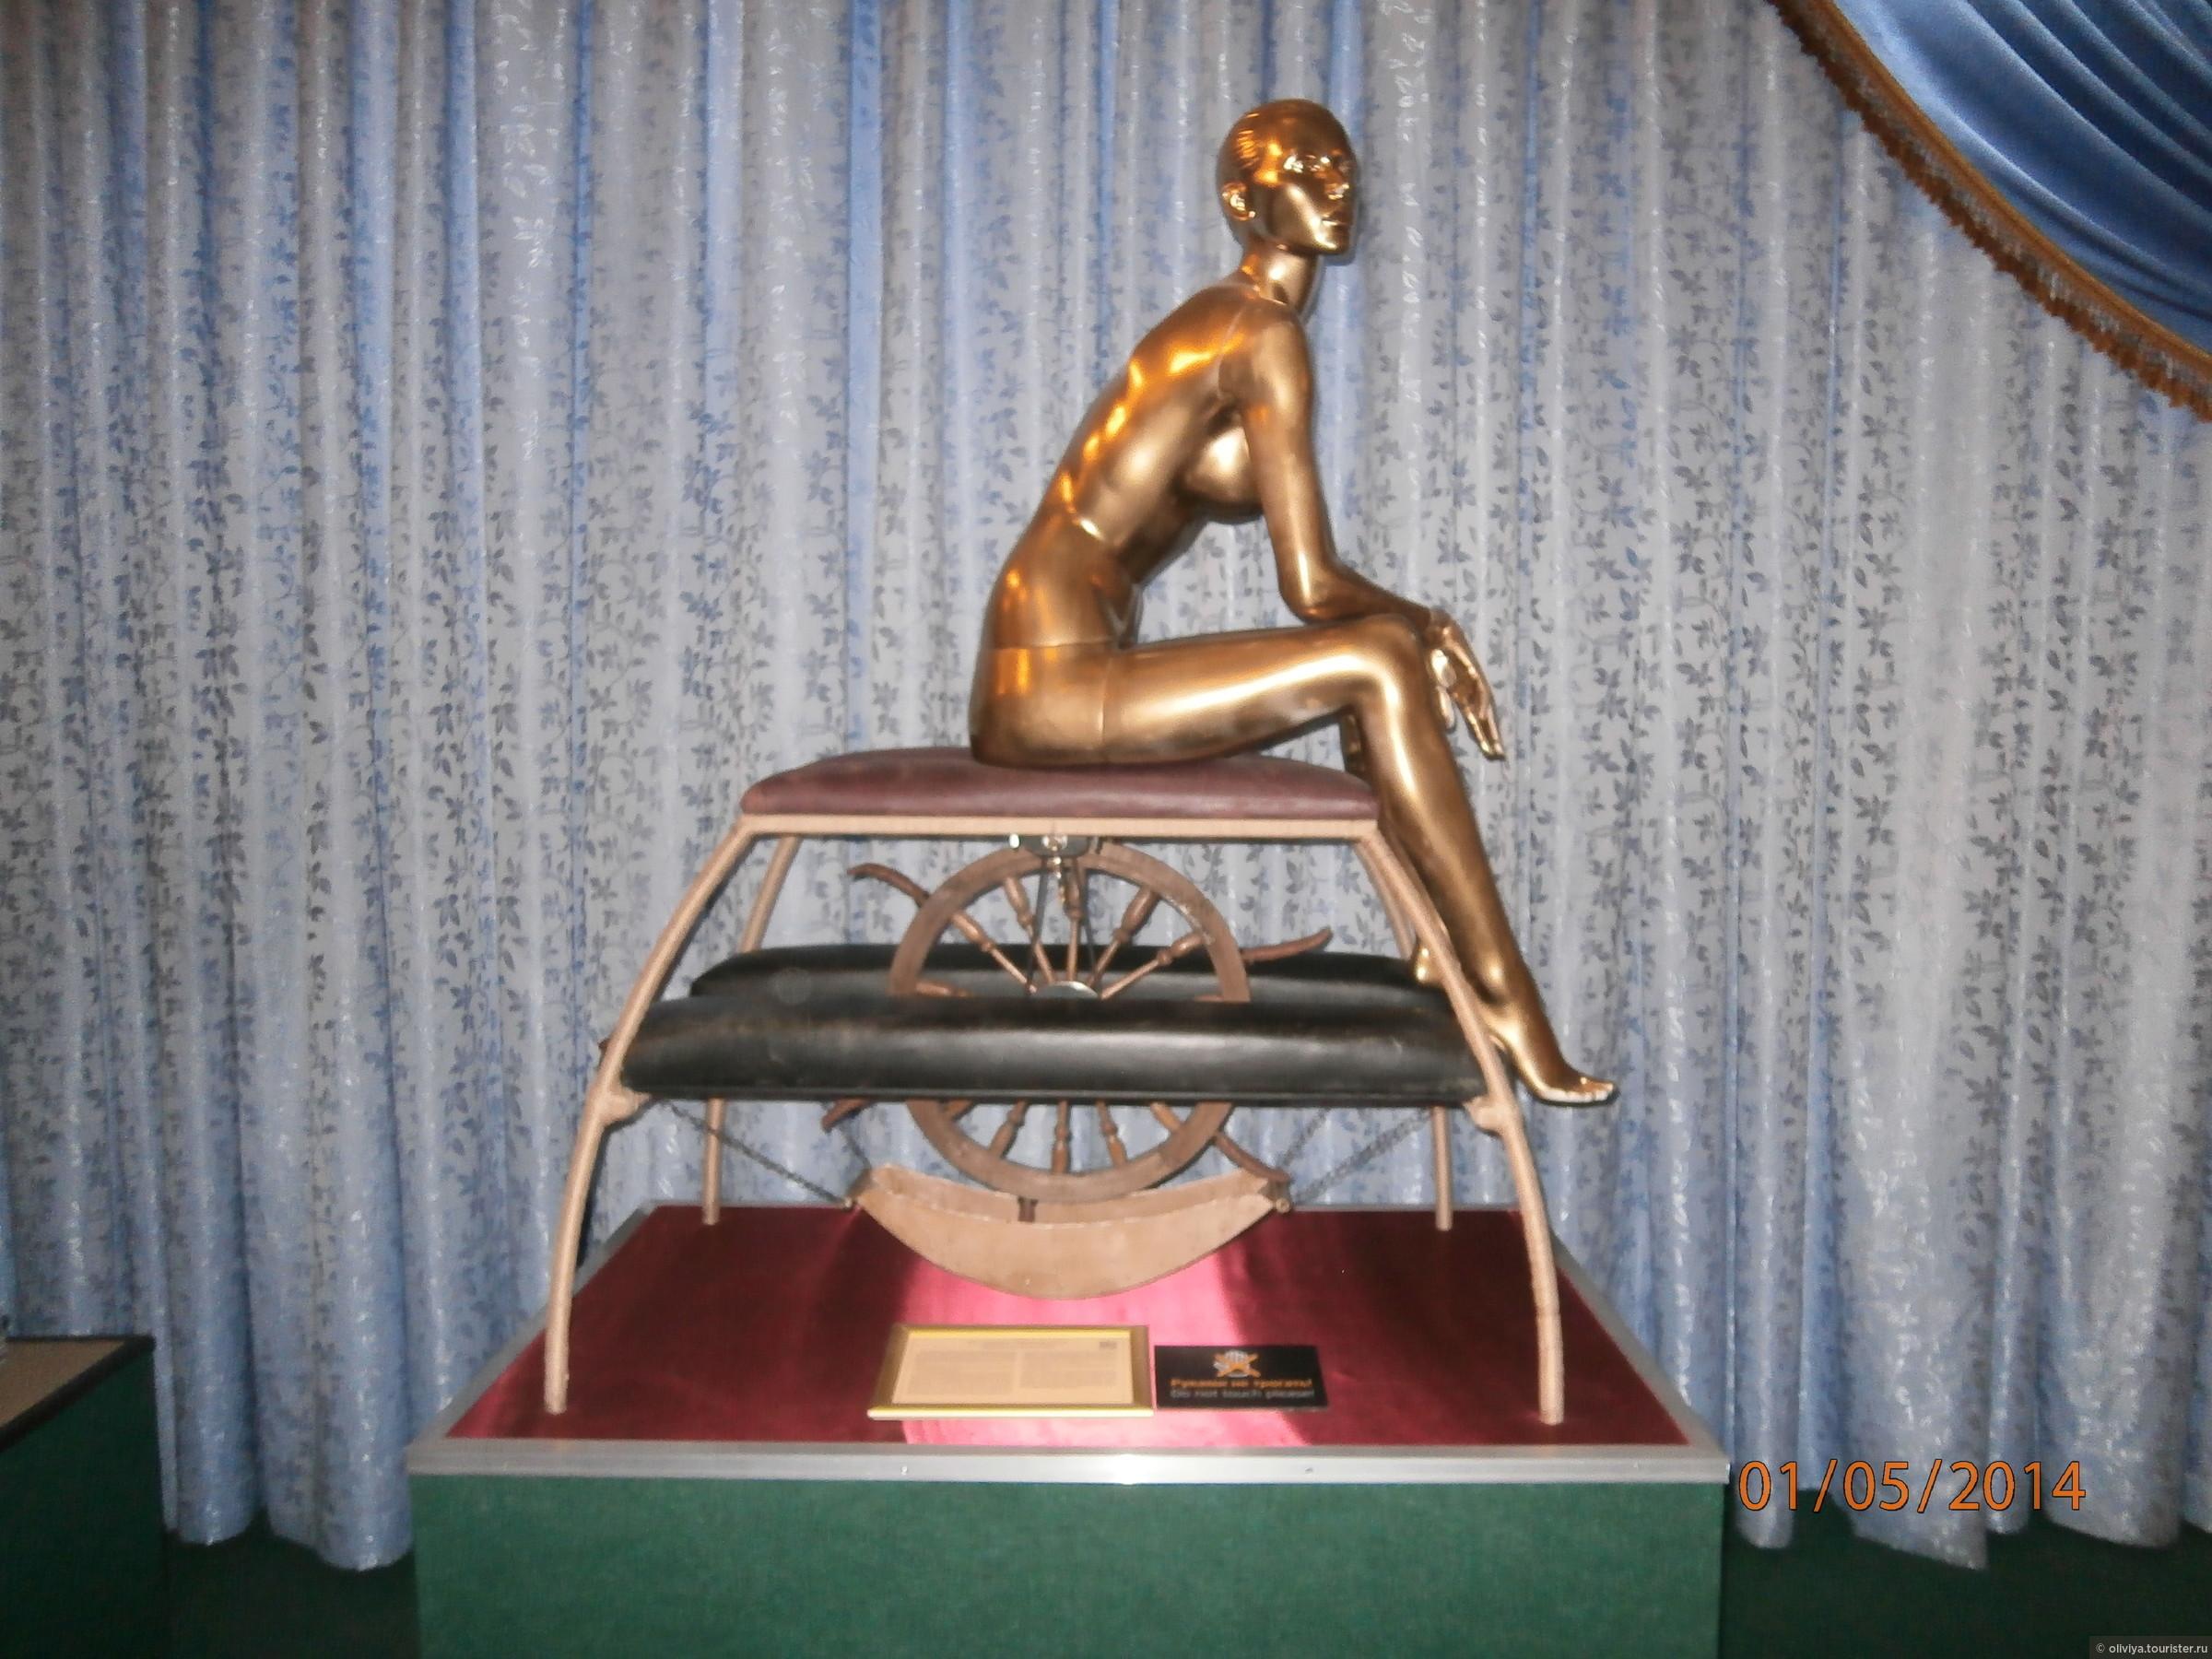 музей секса петербург-ац2